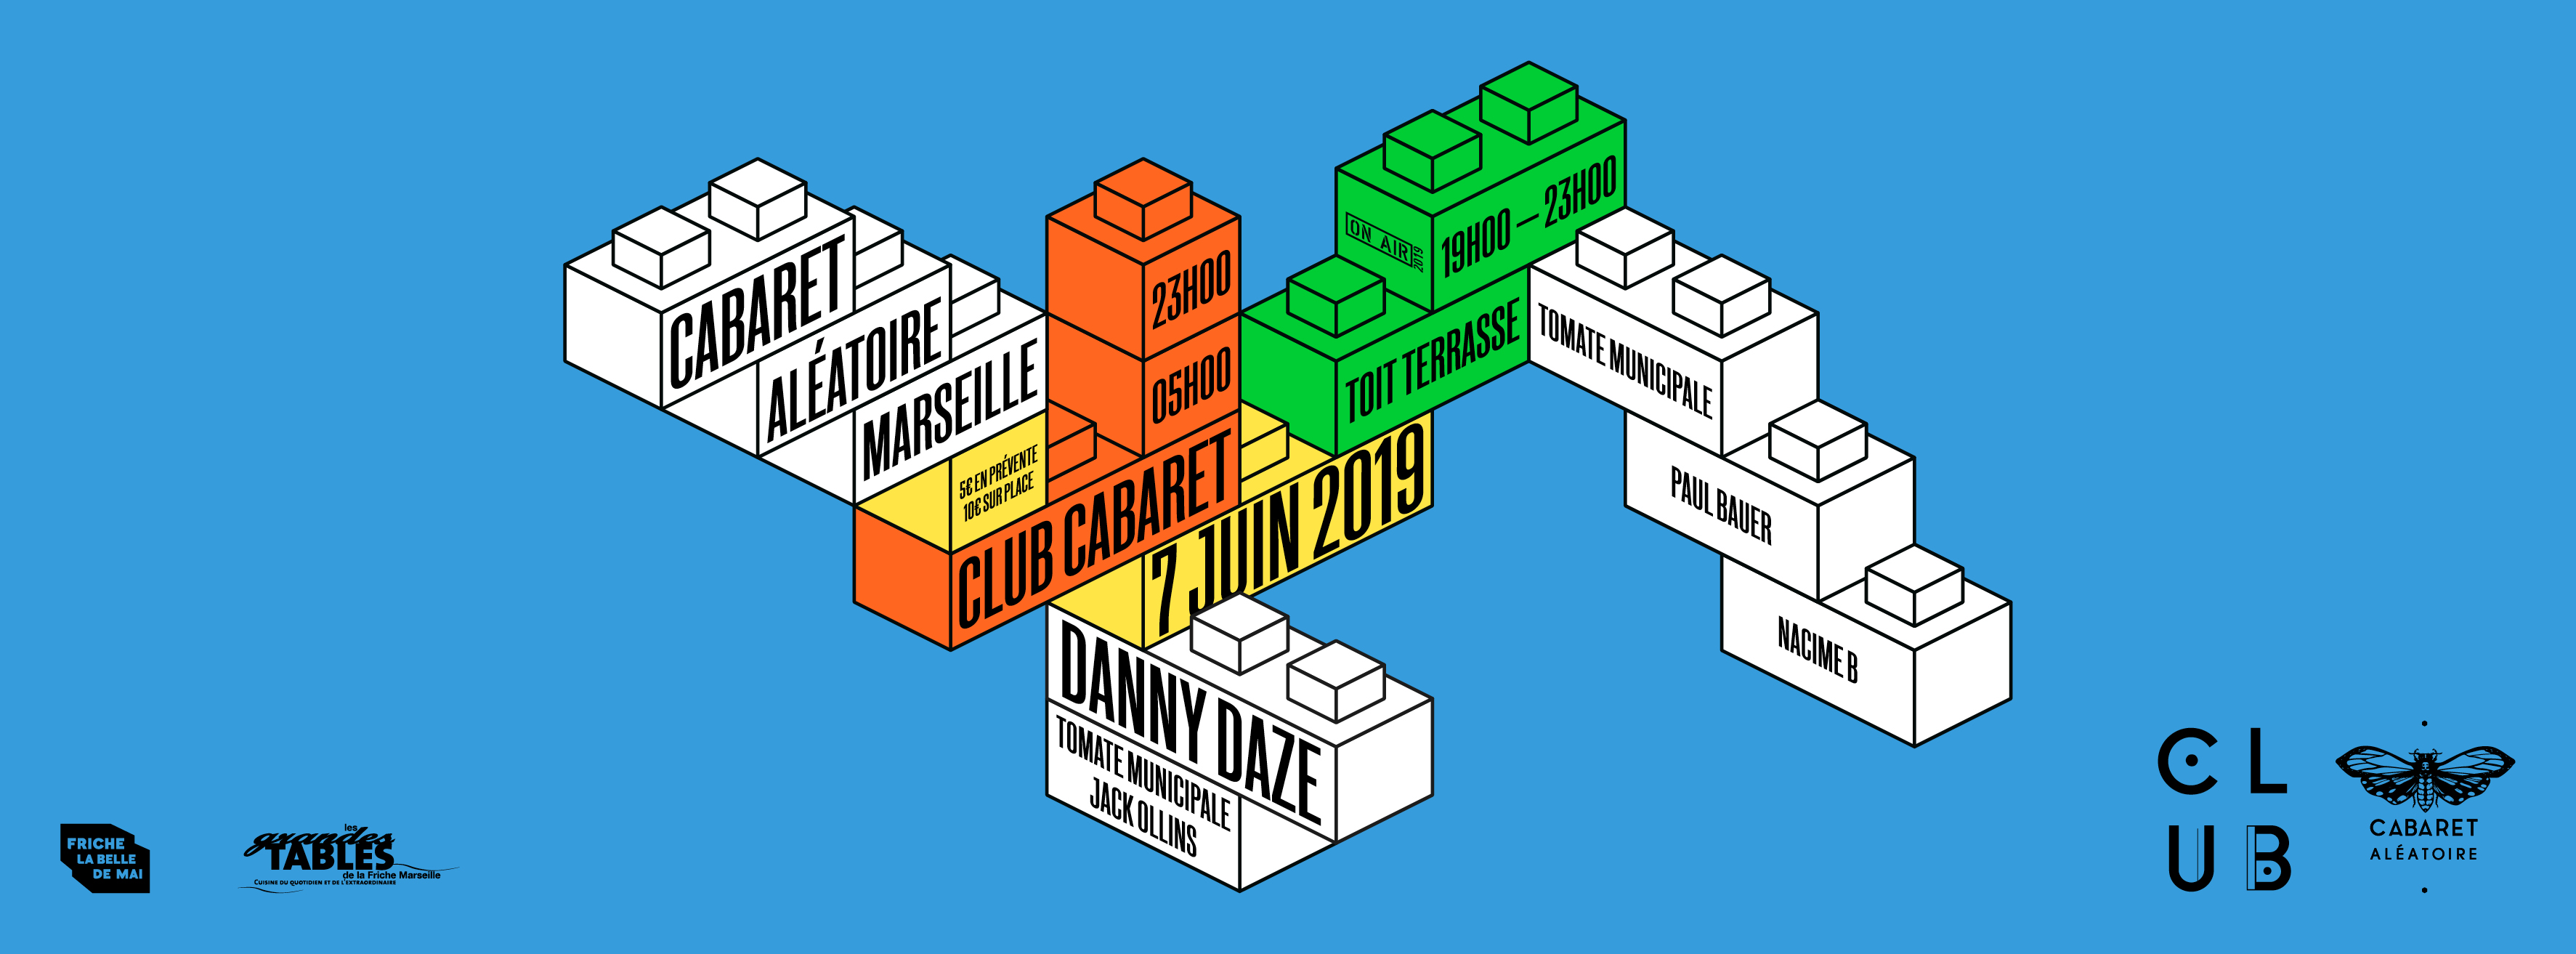 Club Cabaret X : Danny Daze + Tomate Municipale + Jack Ollins